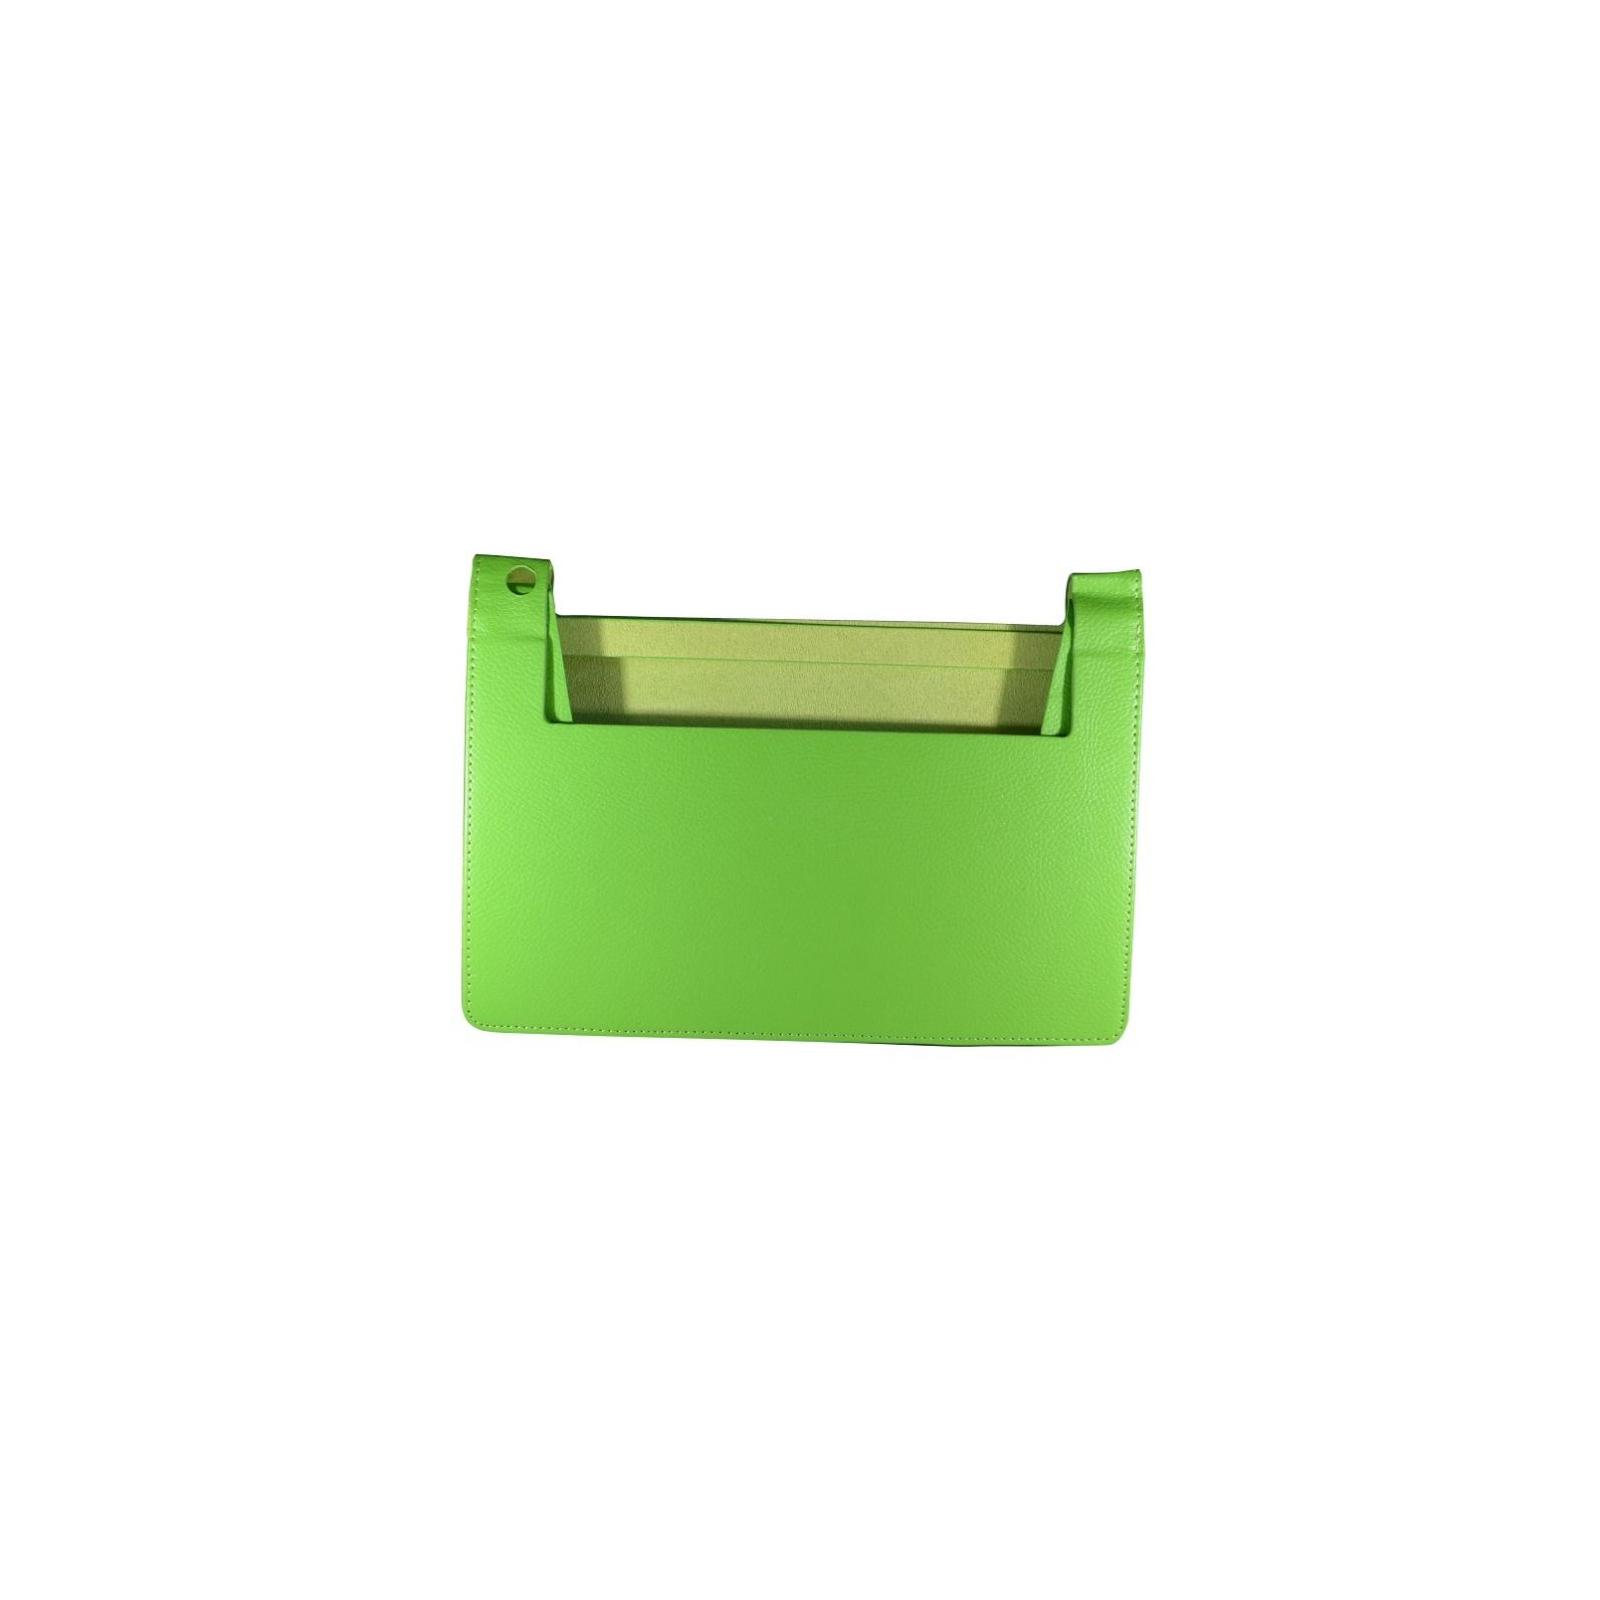 "Чехол для планшета Pro-case 10,1"" Pro-case Lenovo B8080 green (B8080gre) изображение 2"